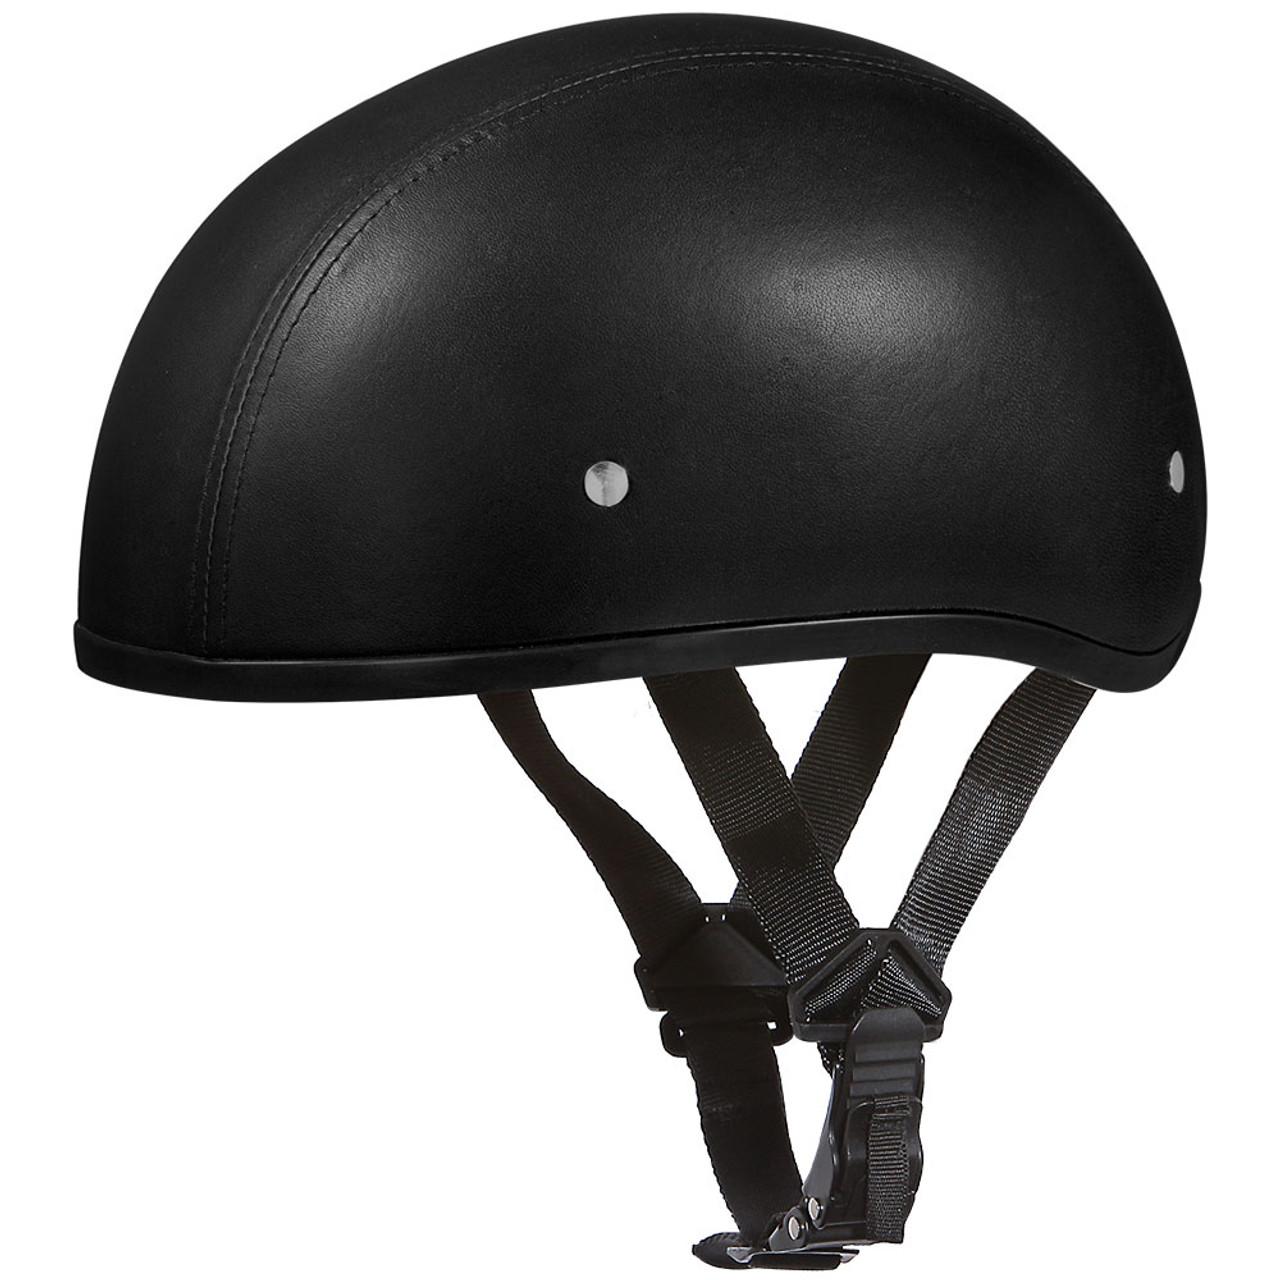 83ad3117b17 Daytona DOT Half Shell Leather Skull Motorcycle Helmet - Get Lowered Cycles